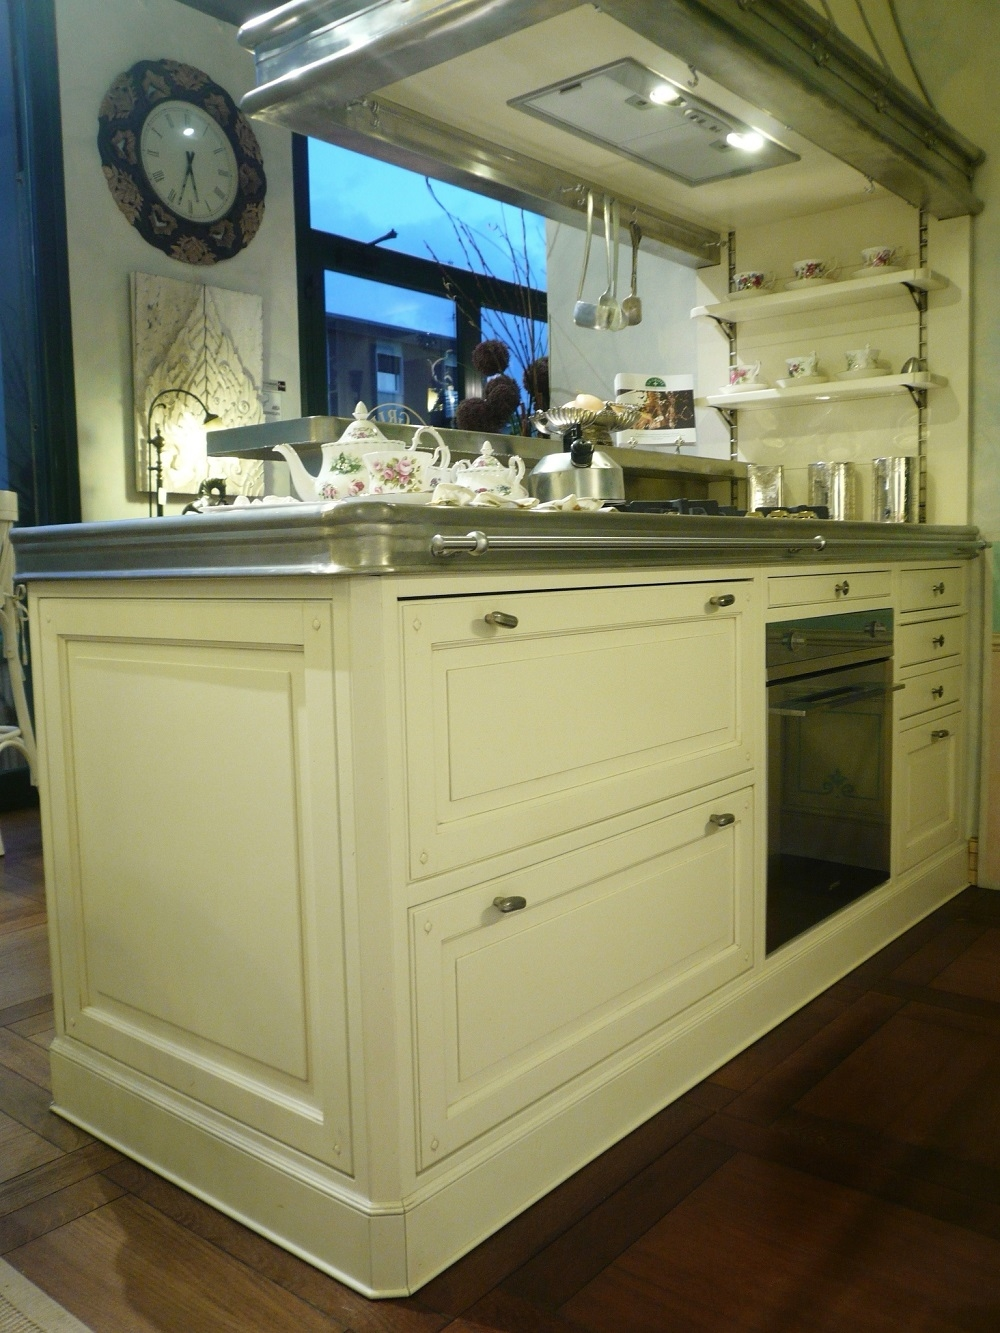 Penisola bifacciale in peltro marchi cucine in offerta for Cucine in offerta